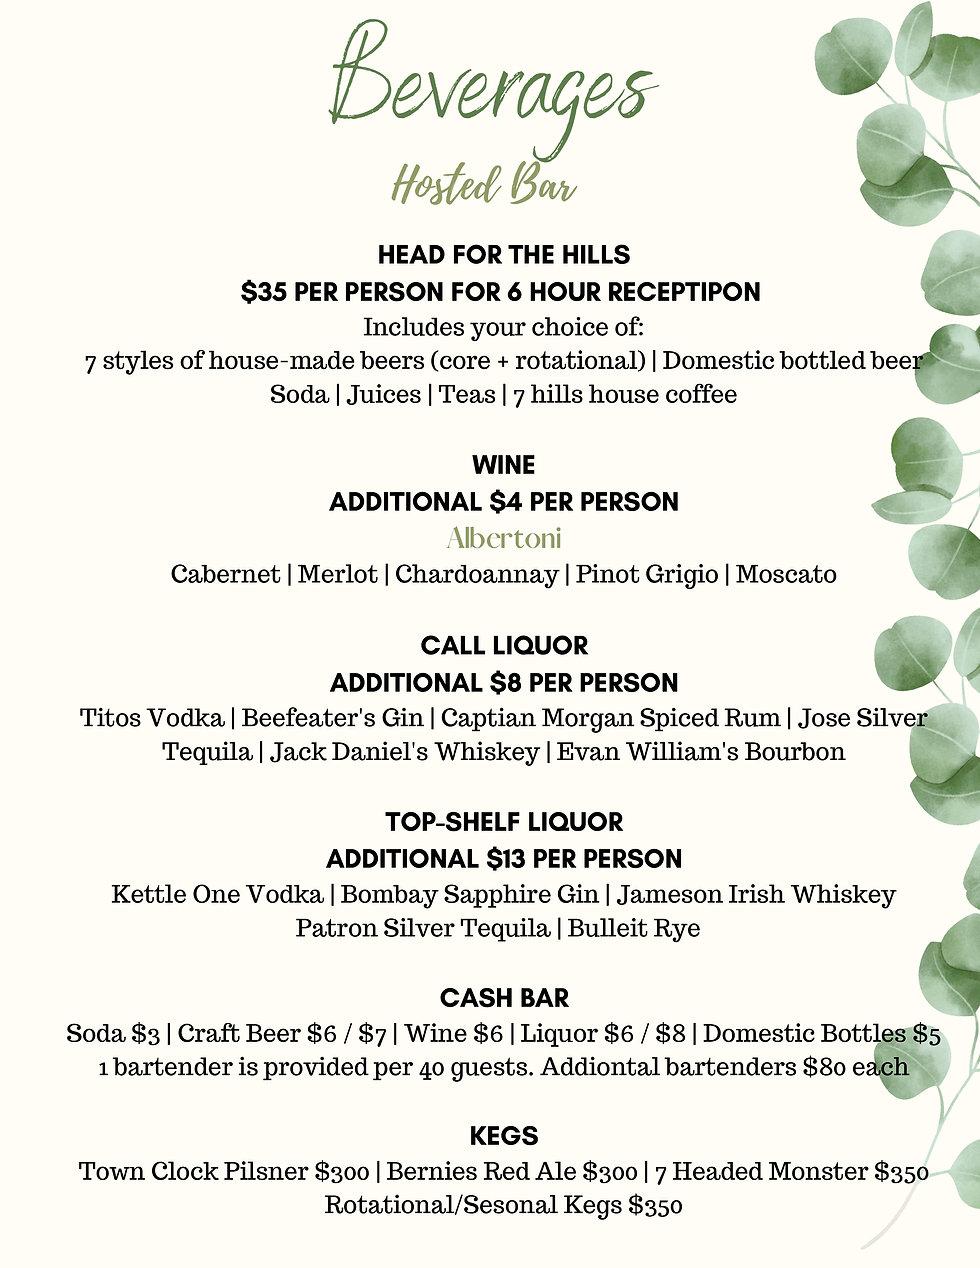 Wedding Beverage options 7 Hills Event Center